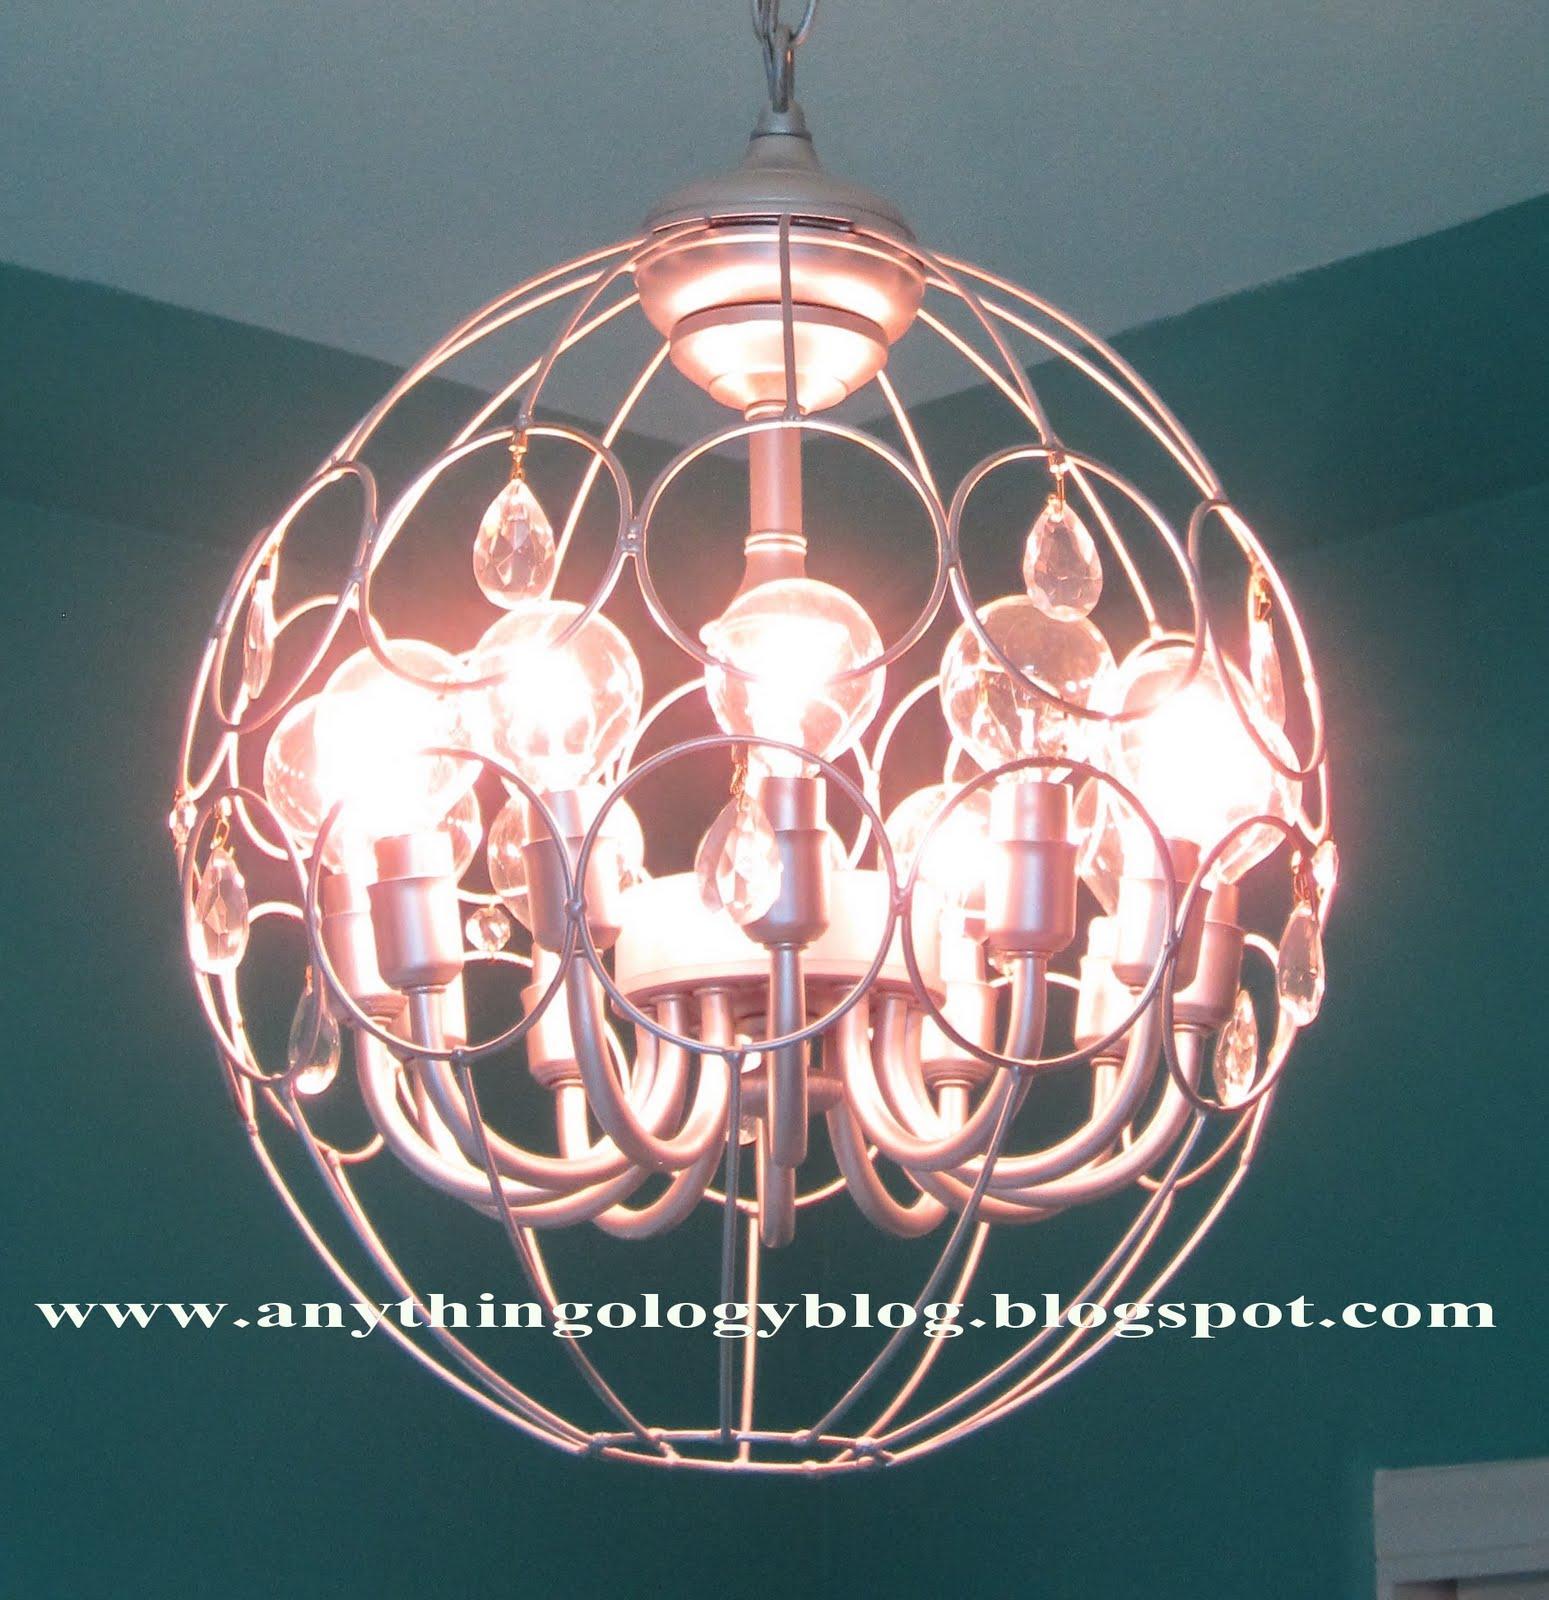 Hanging Light With Planter: Anythingology: Metal Hanging Planter Light #2